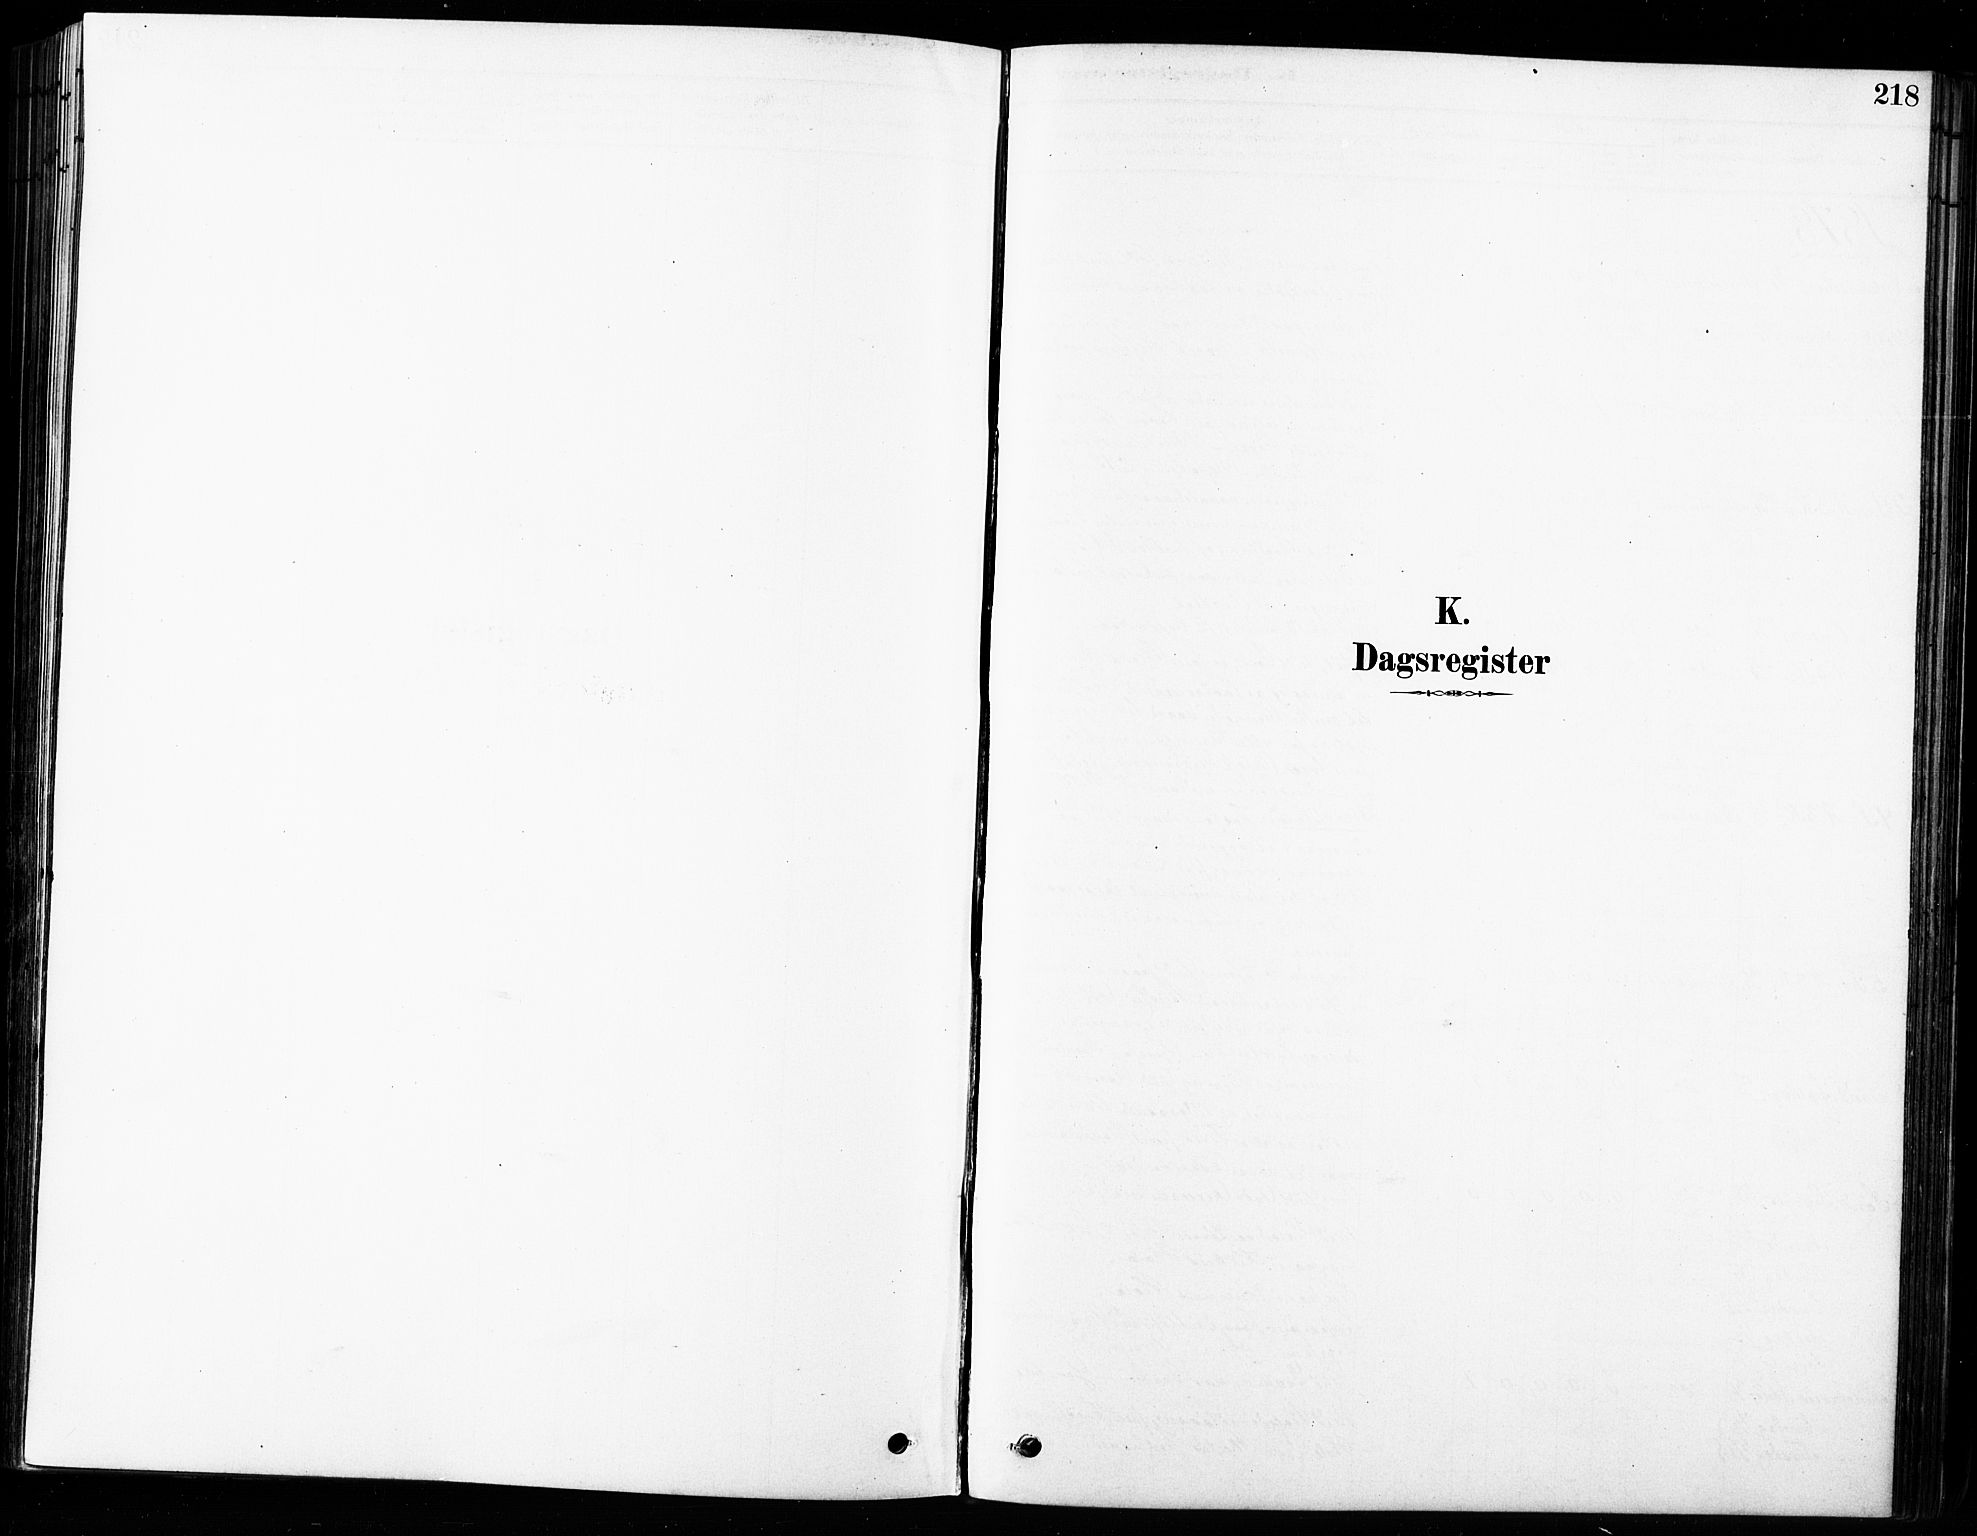 SATØ, Trondenes sokneprestkontor, H/Ha/L0015kirke: Parish register (official) no. 15, 1878-1889, p. 218